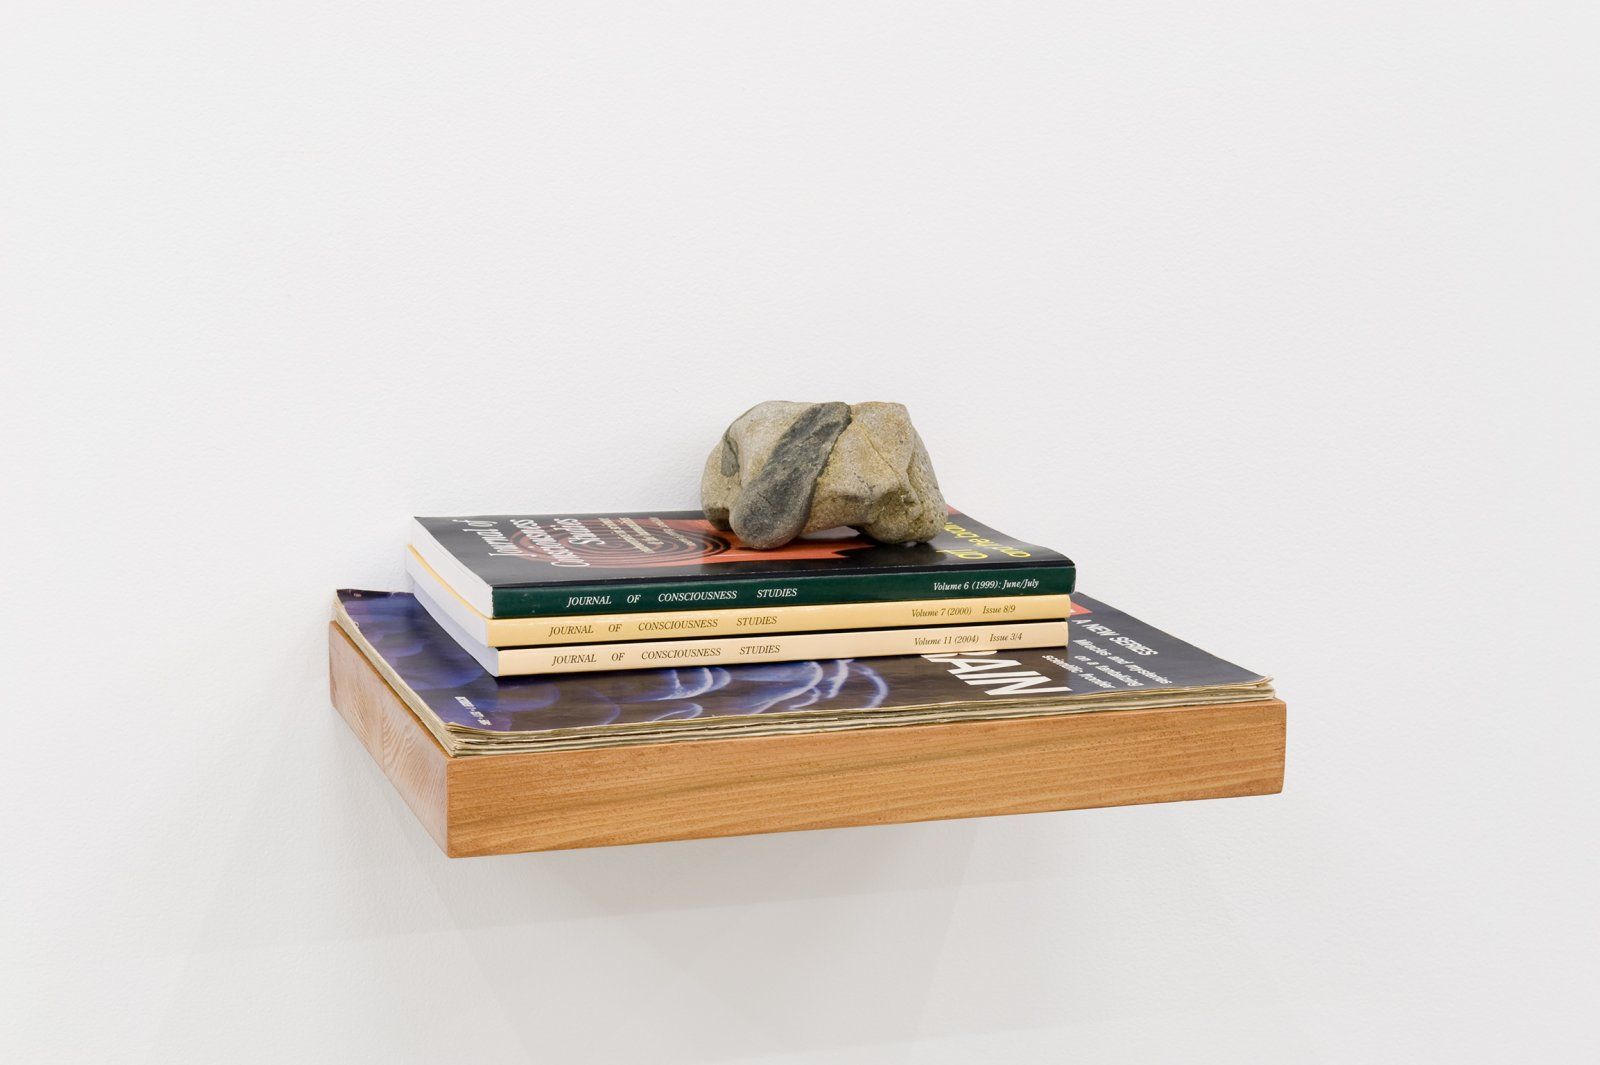 Judy Radul, The Brain Display (detail), 2010, mirror, wood, 5 stones, plastic book holder, Life magazines, doll, 67 x 40 x 80 in. (170 x 102 x 203 cm) by Judy Radul